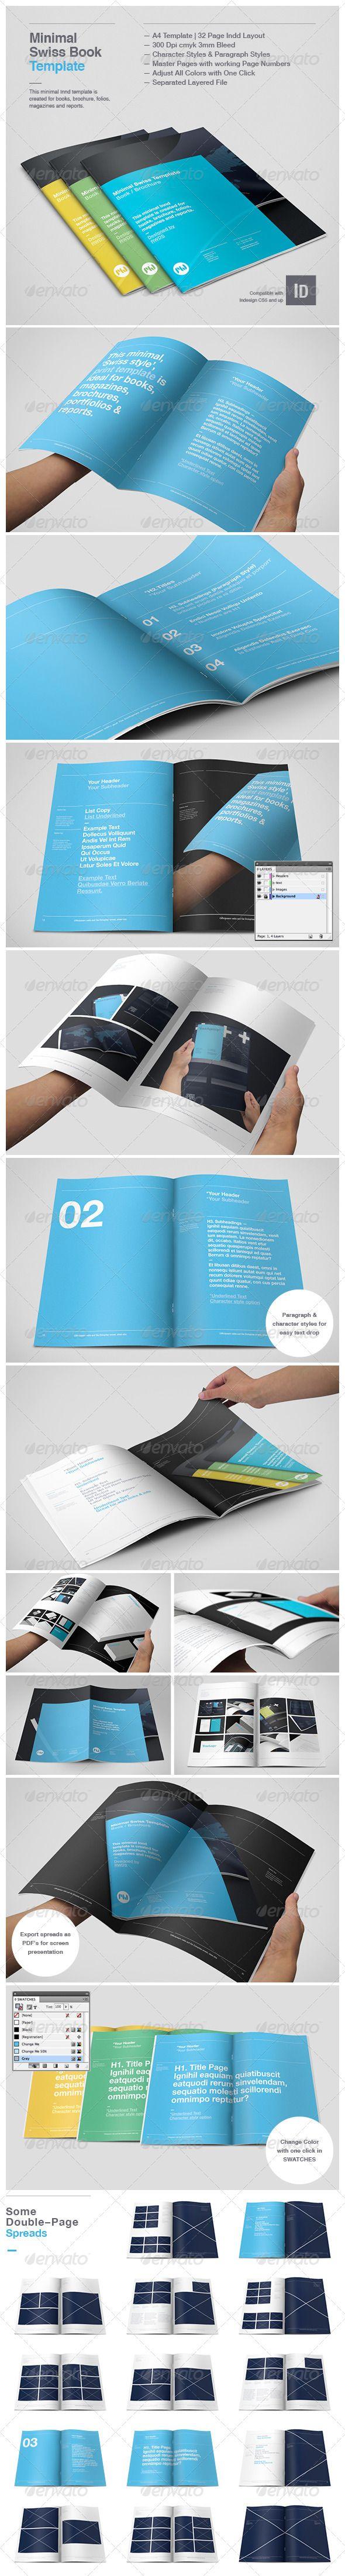 94 best print templates images on pinterest print templates font